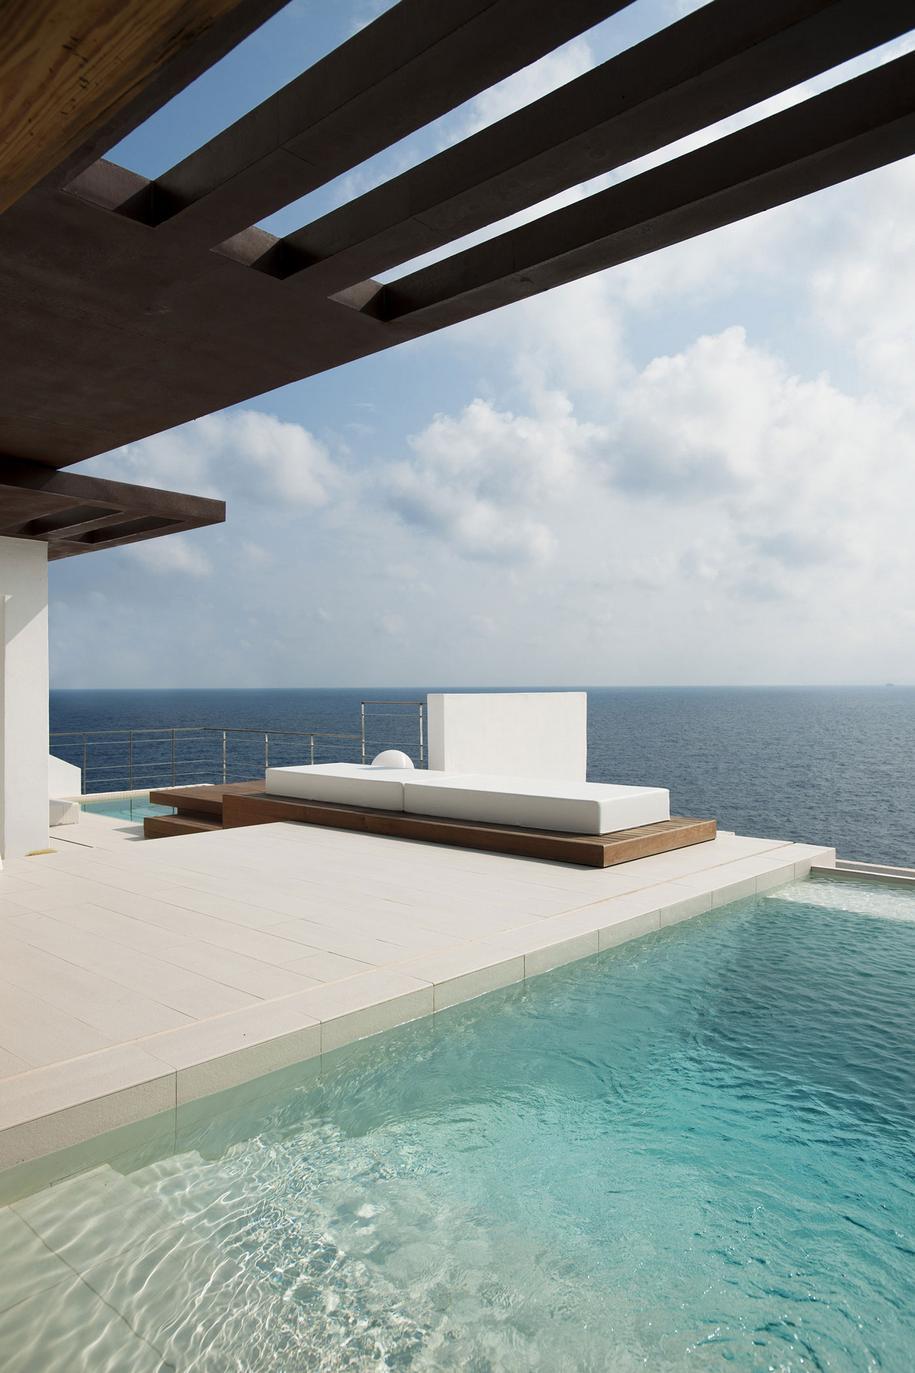 Особняк на Ибице с потрясающим видом на Средиземное море